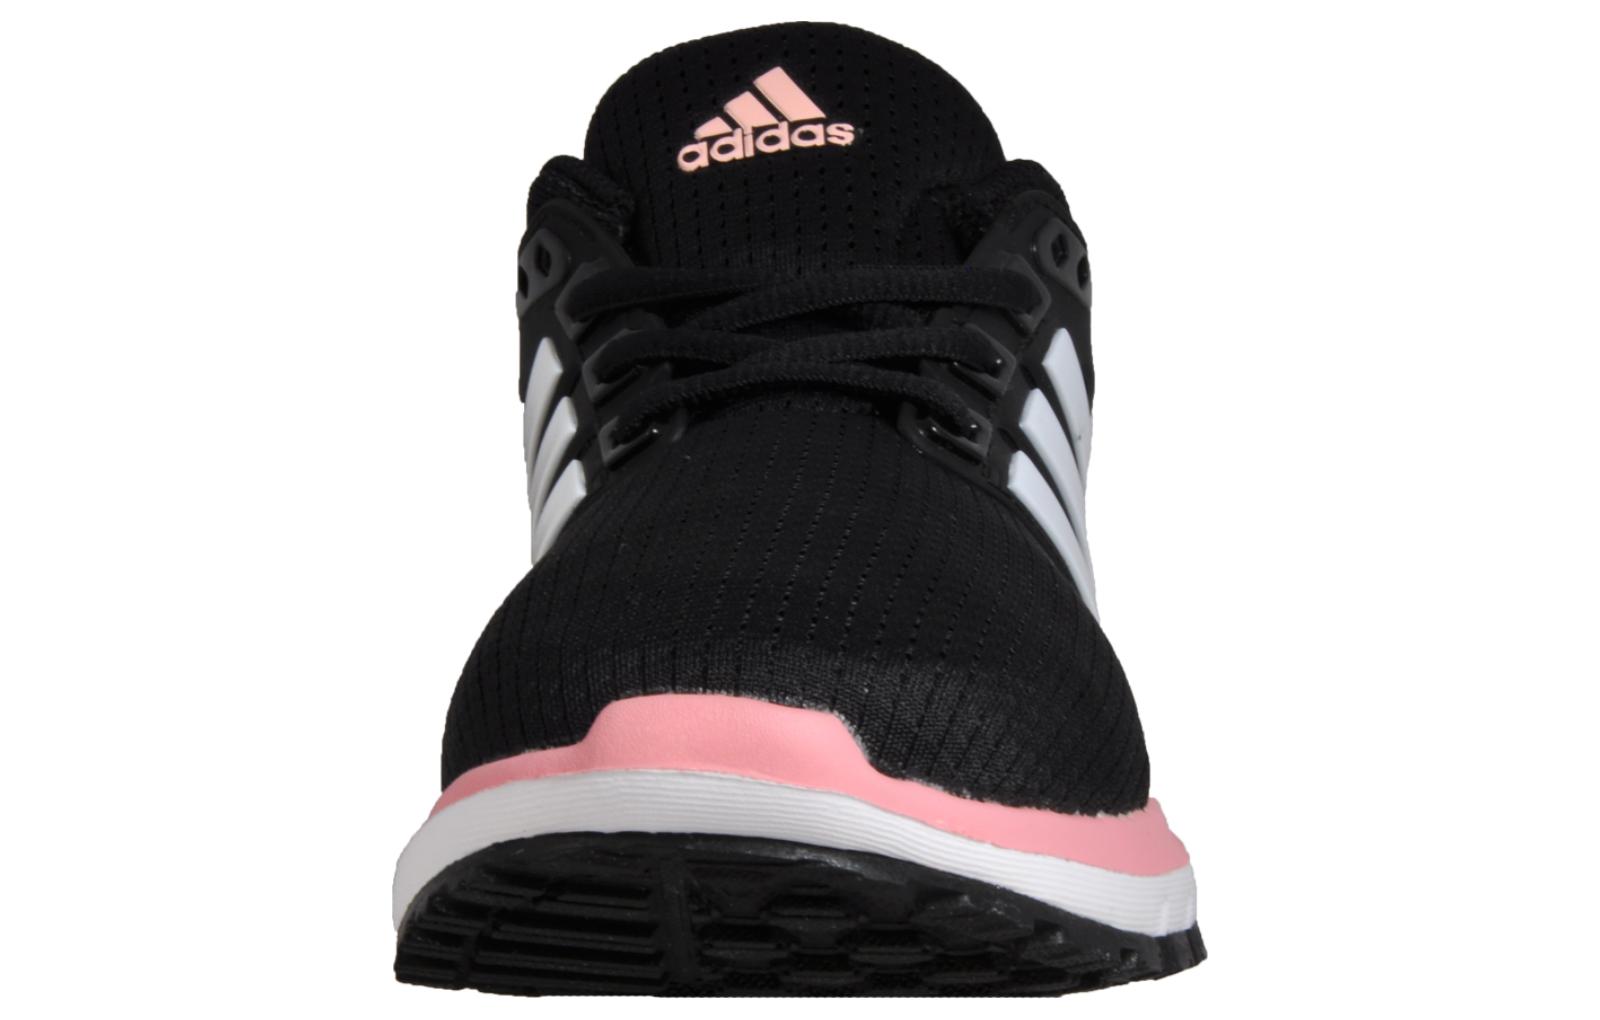 sports shoes 0b560 7bdf8 Adidas Energy Cloud WTC Women s Running Shoes Fitness Gym Fashion Trainers  Black